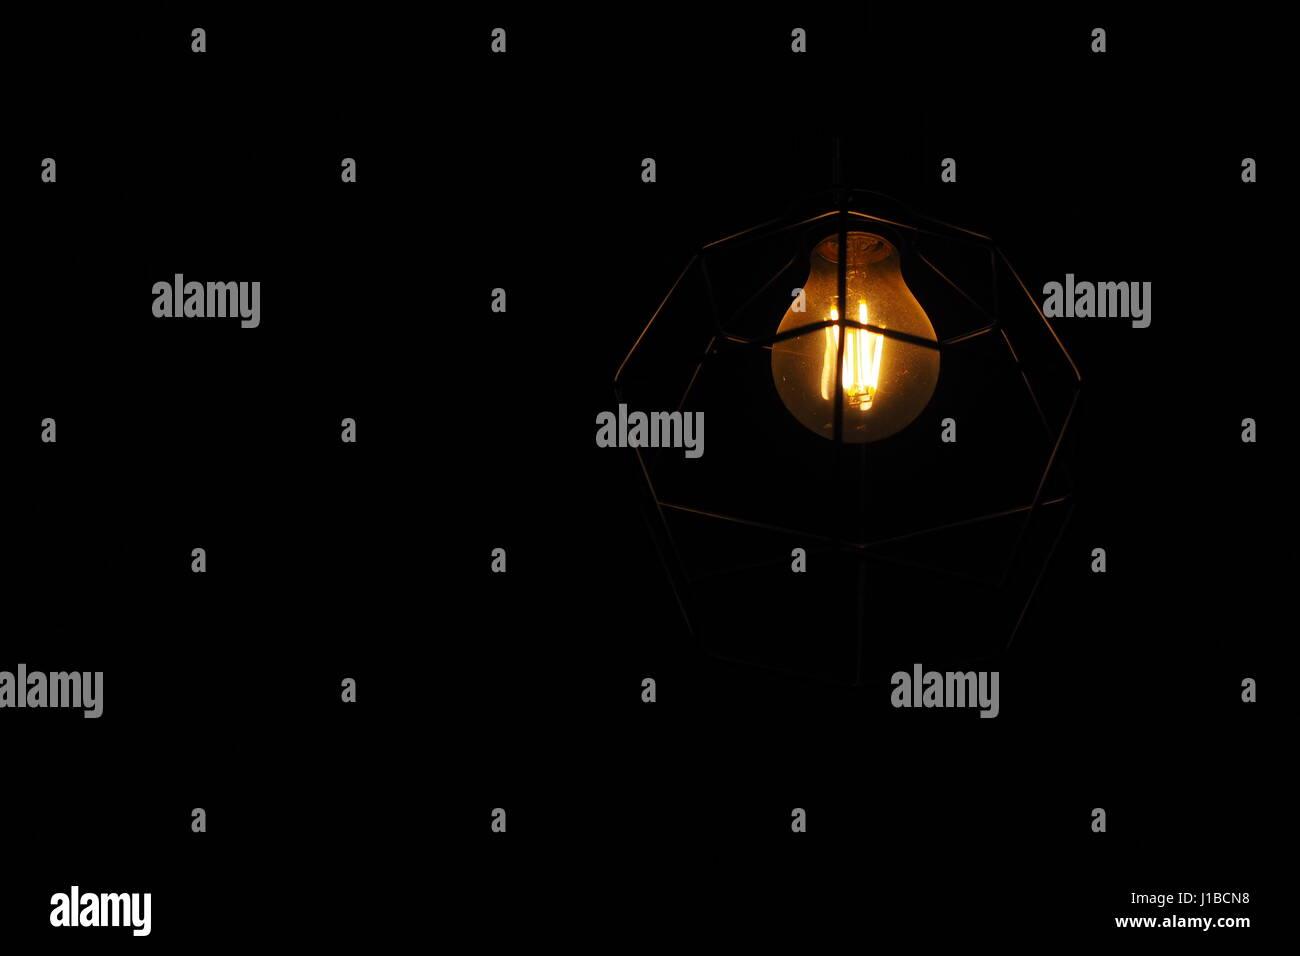 Dark room with light bulb - Isolated Light Bulb In A Dark Room